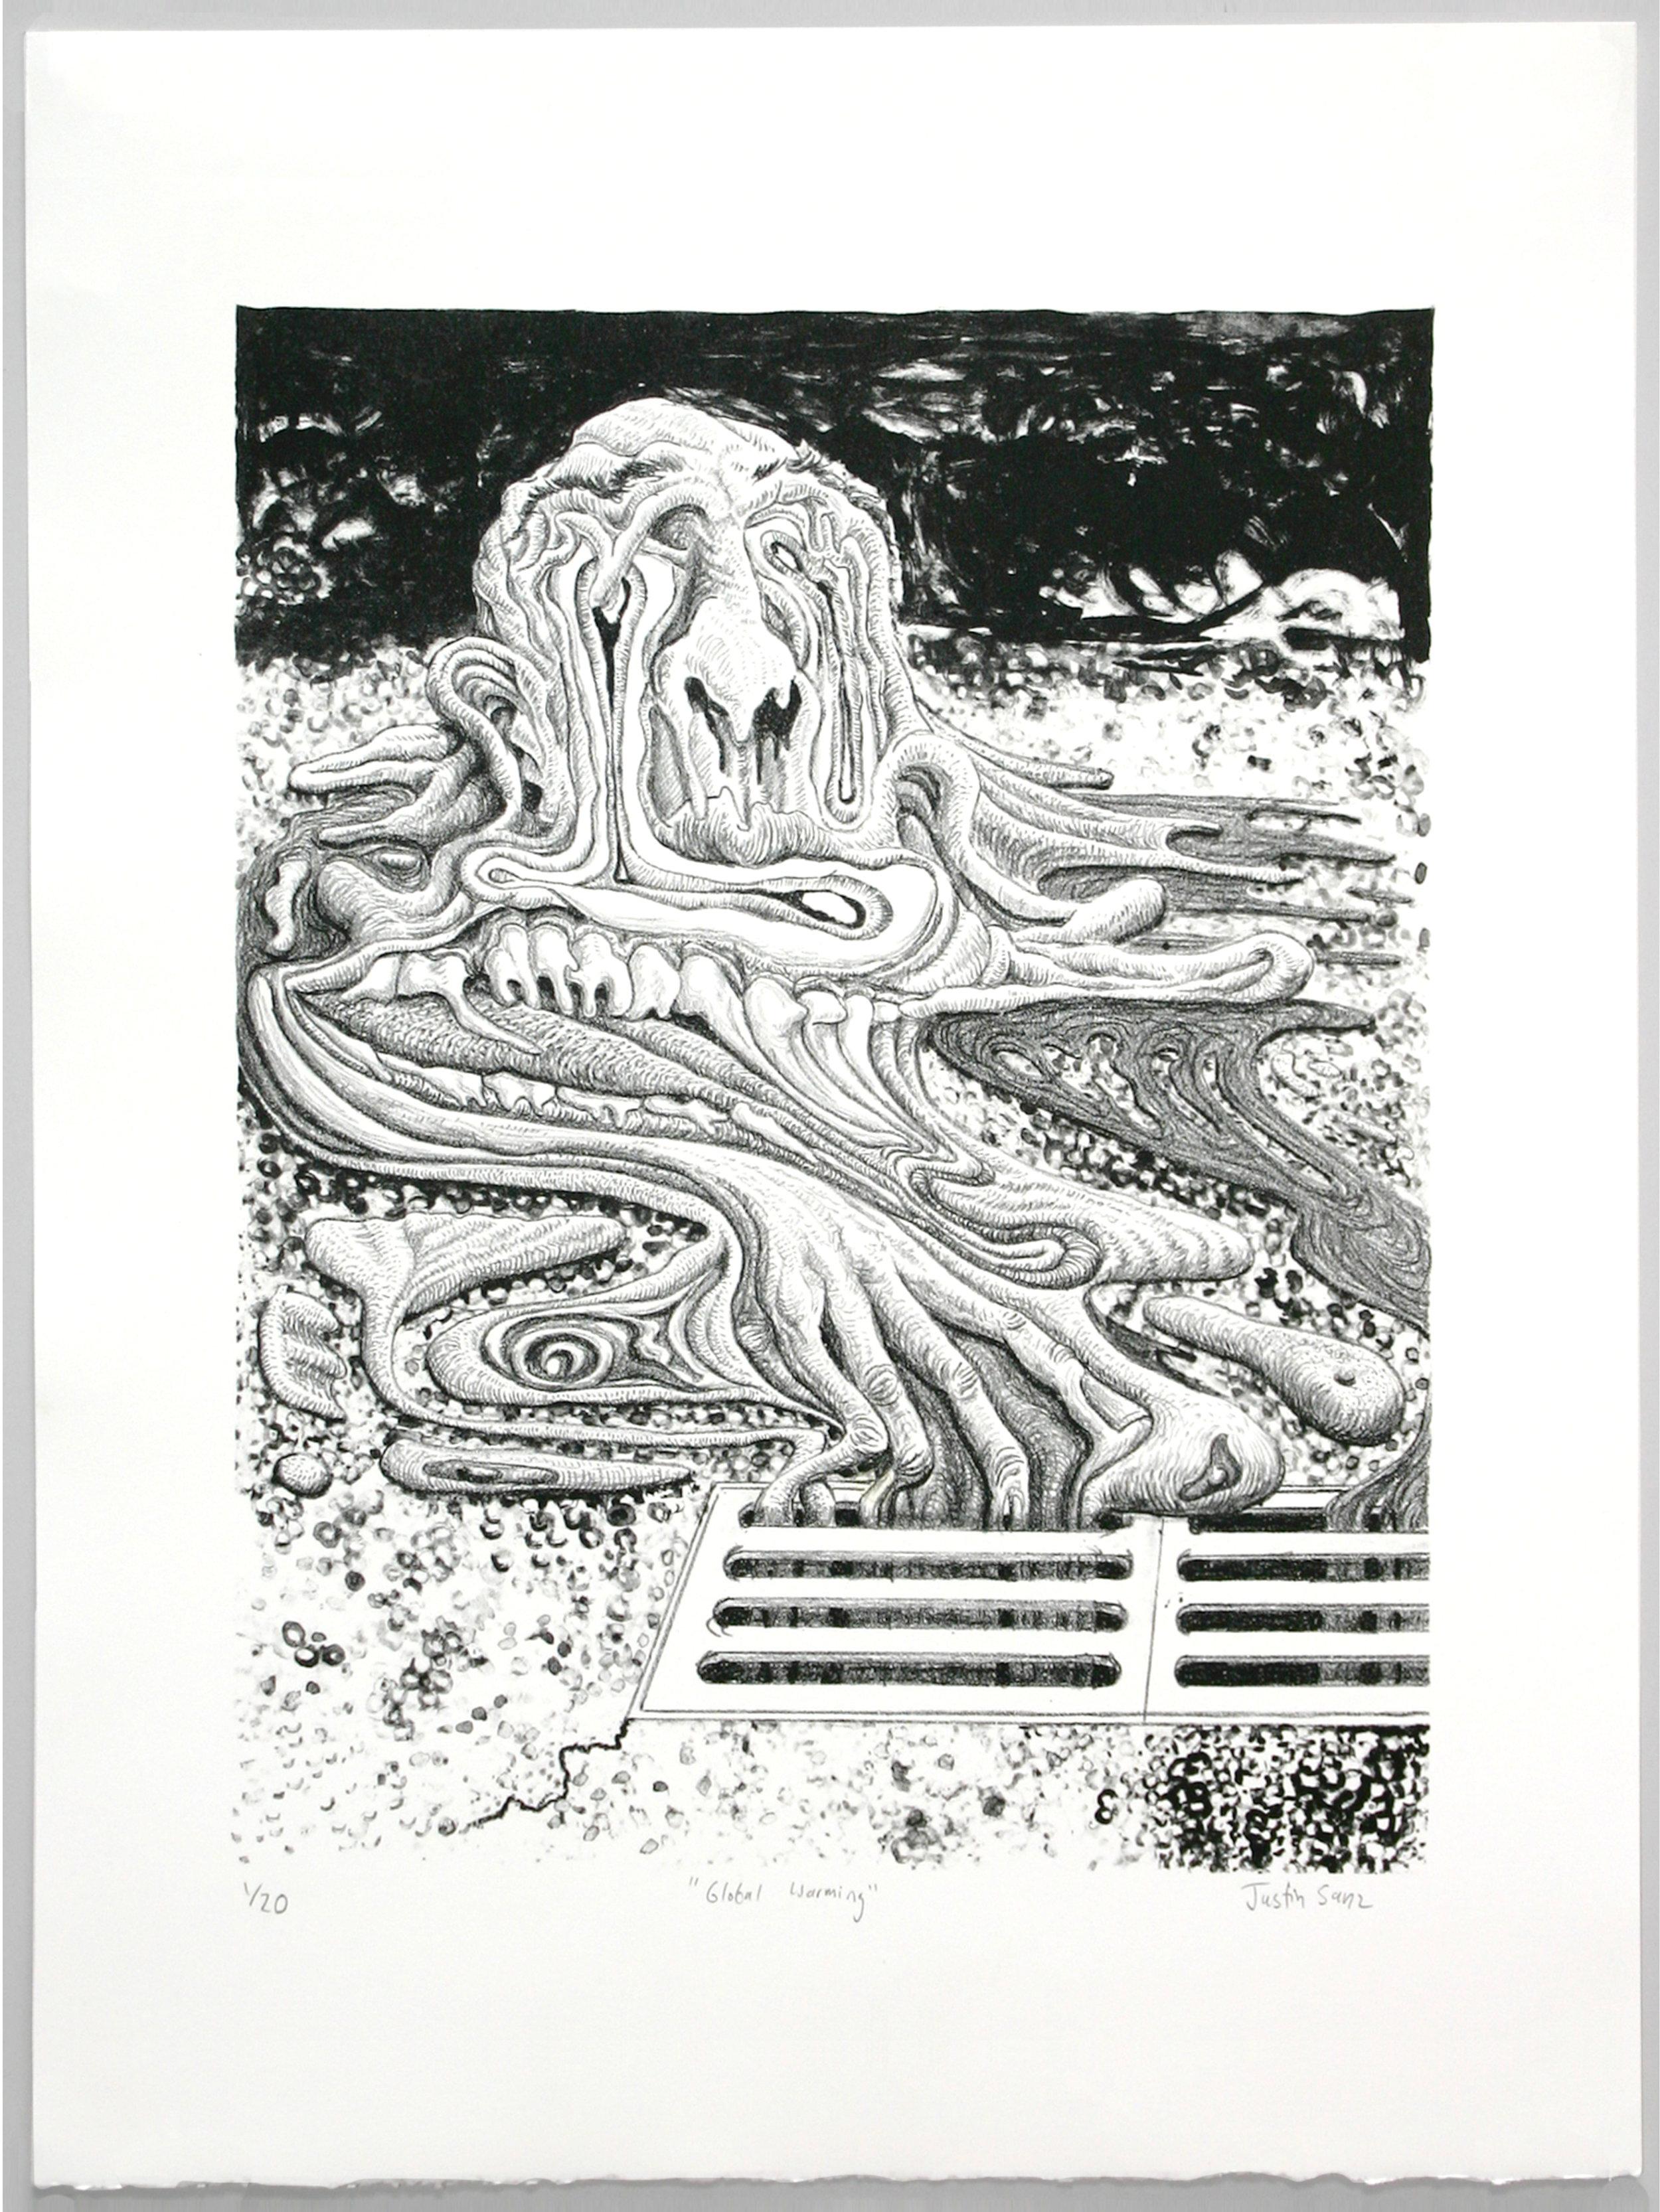 """Global Warming""   Justin Sanz  Stone lithograph"